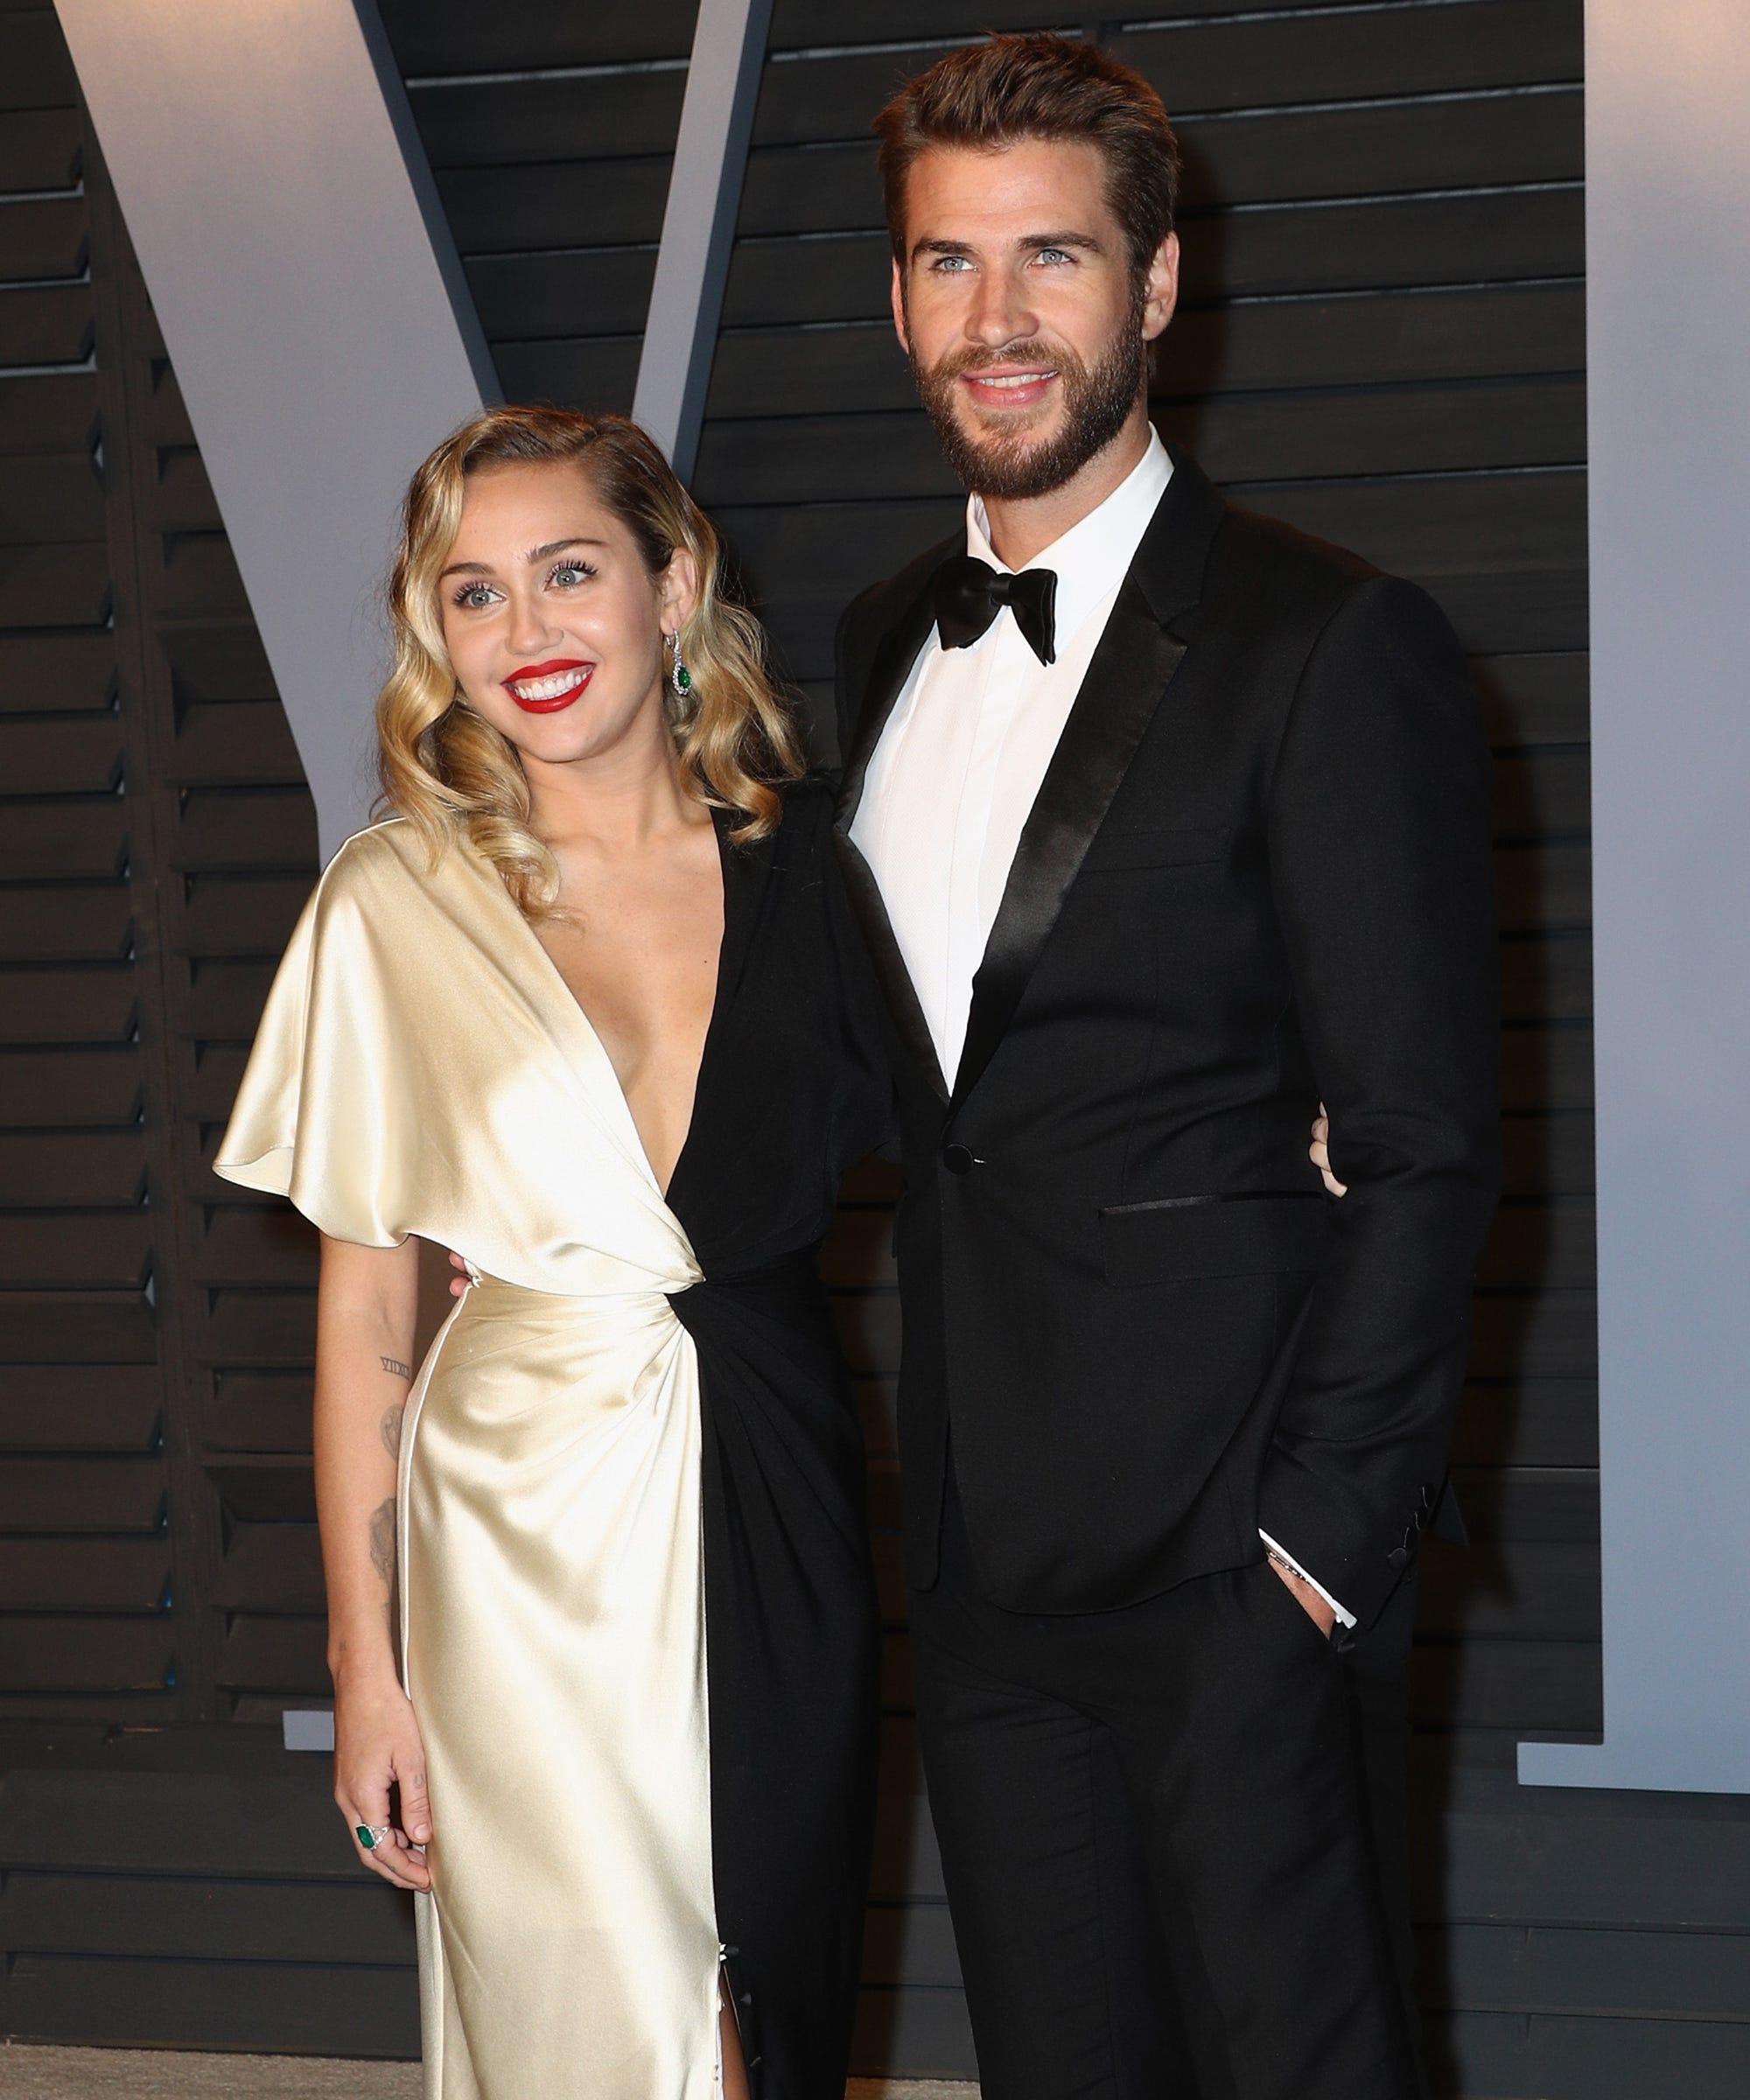 Miley Cyrus Liam Hemsworth Honeymoon Details